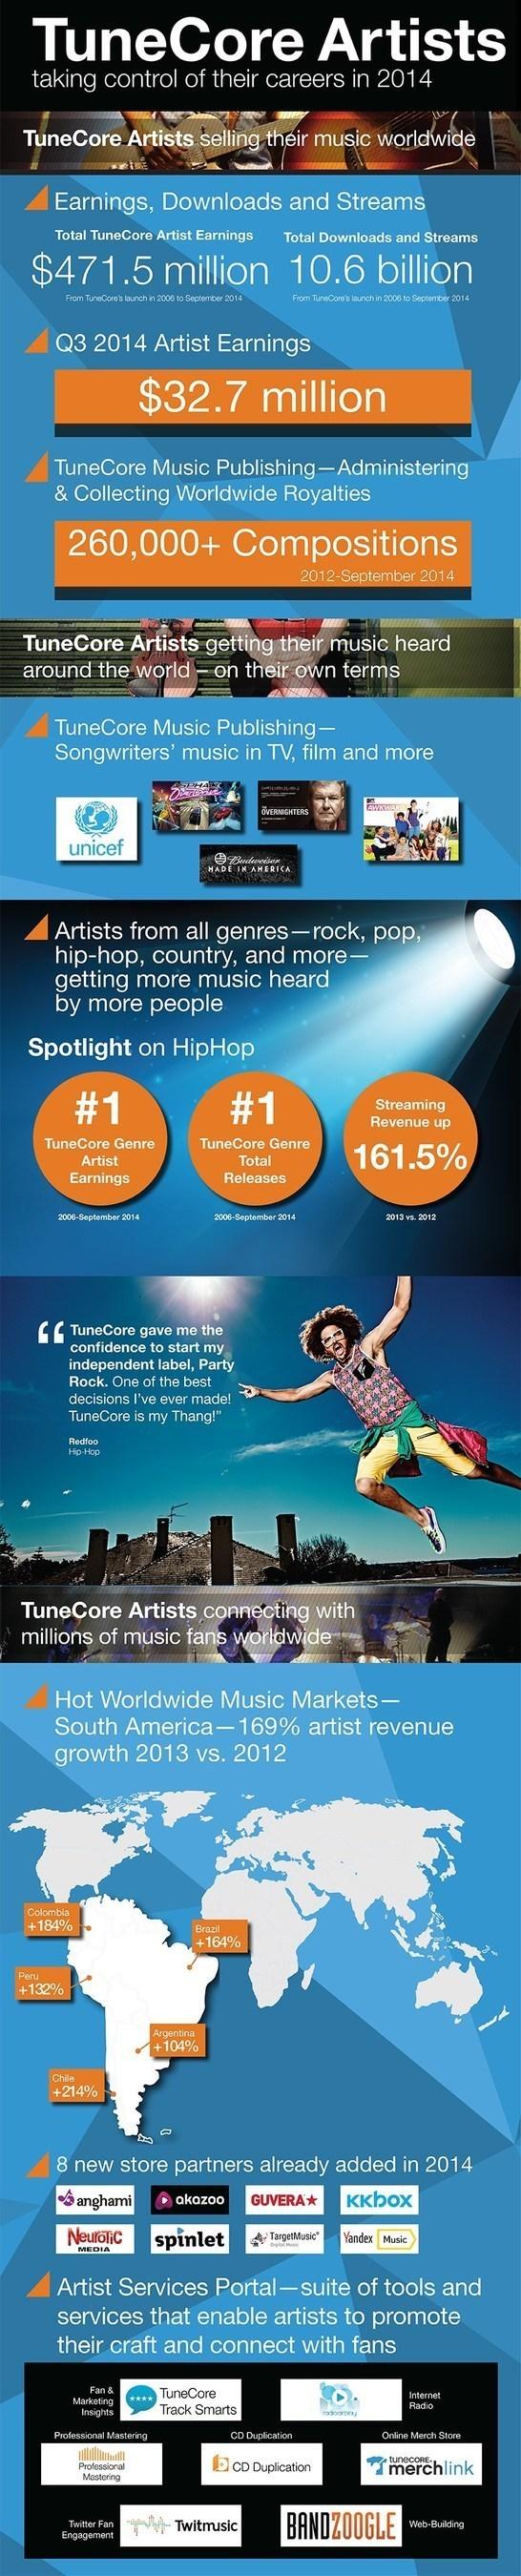 TuneCore Artists earn $32.7 million in Q3 2014, $471.5 million since 2006 based on 10.6 billion combined ...